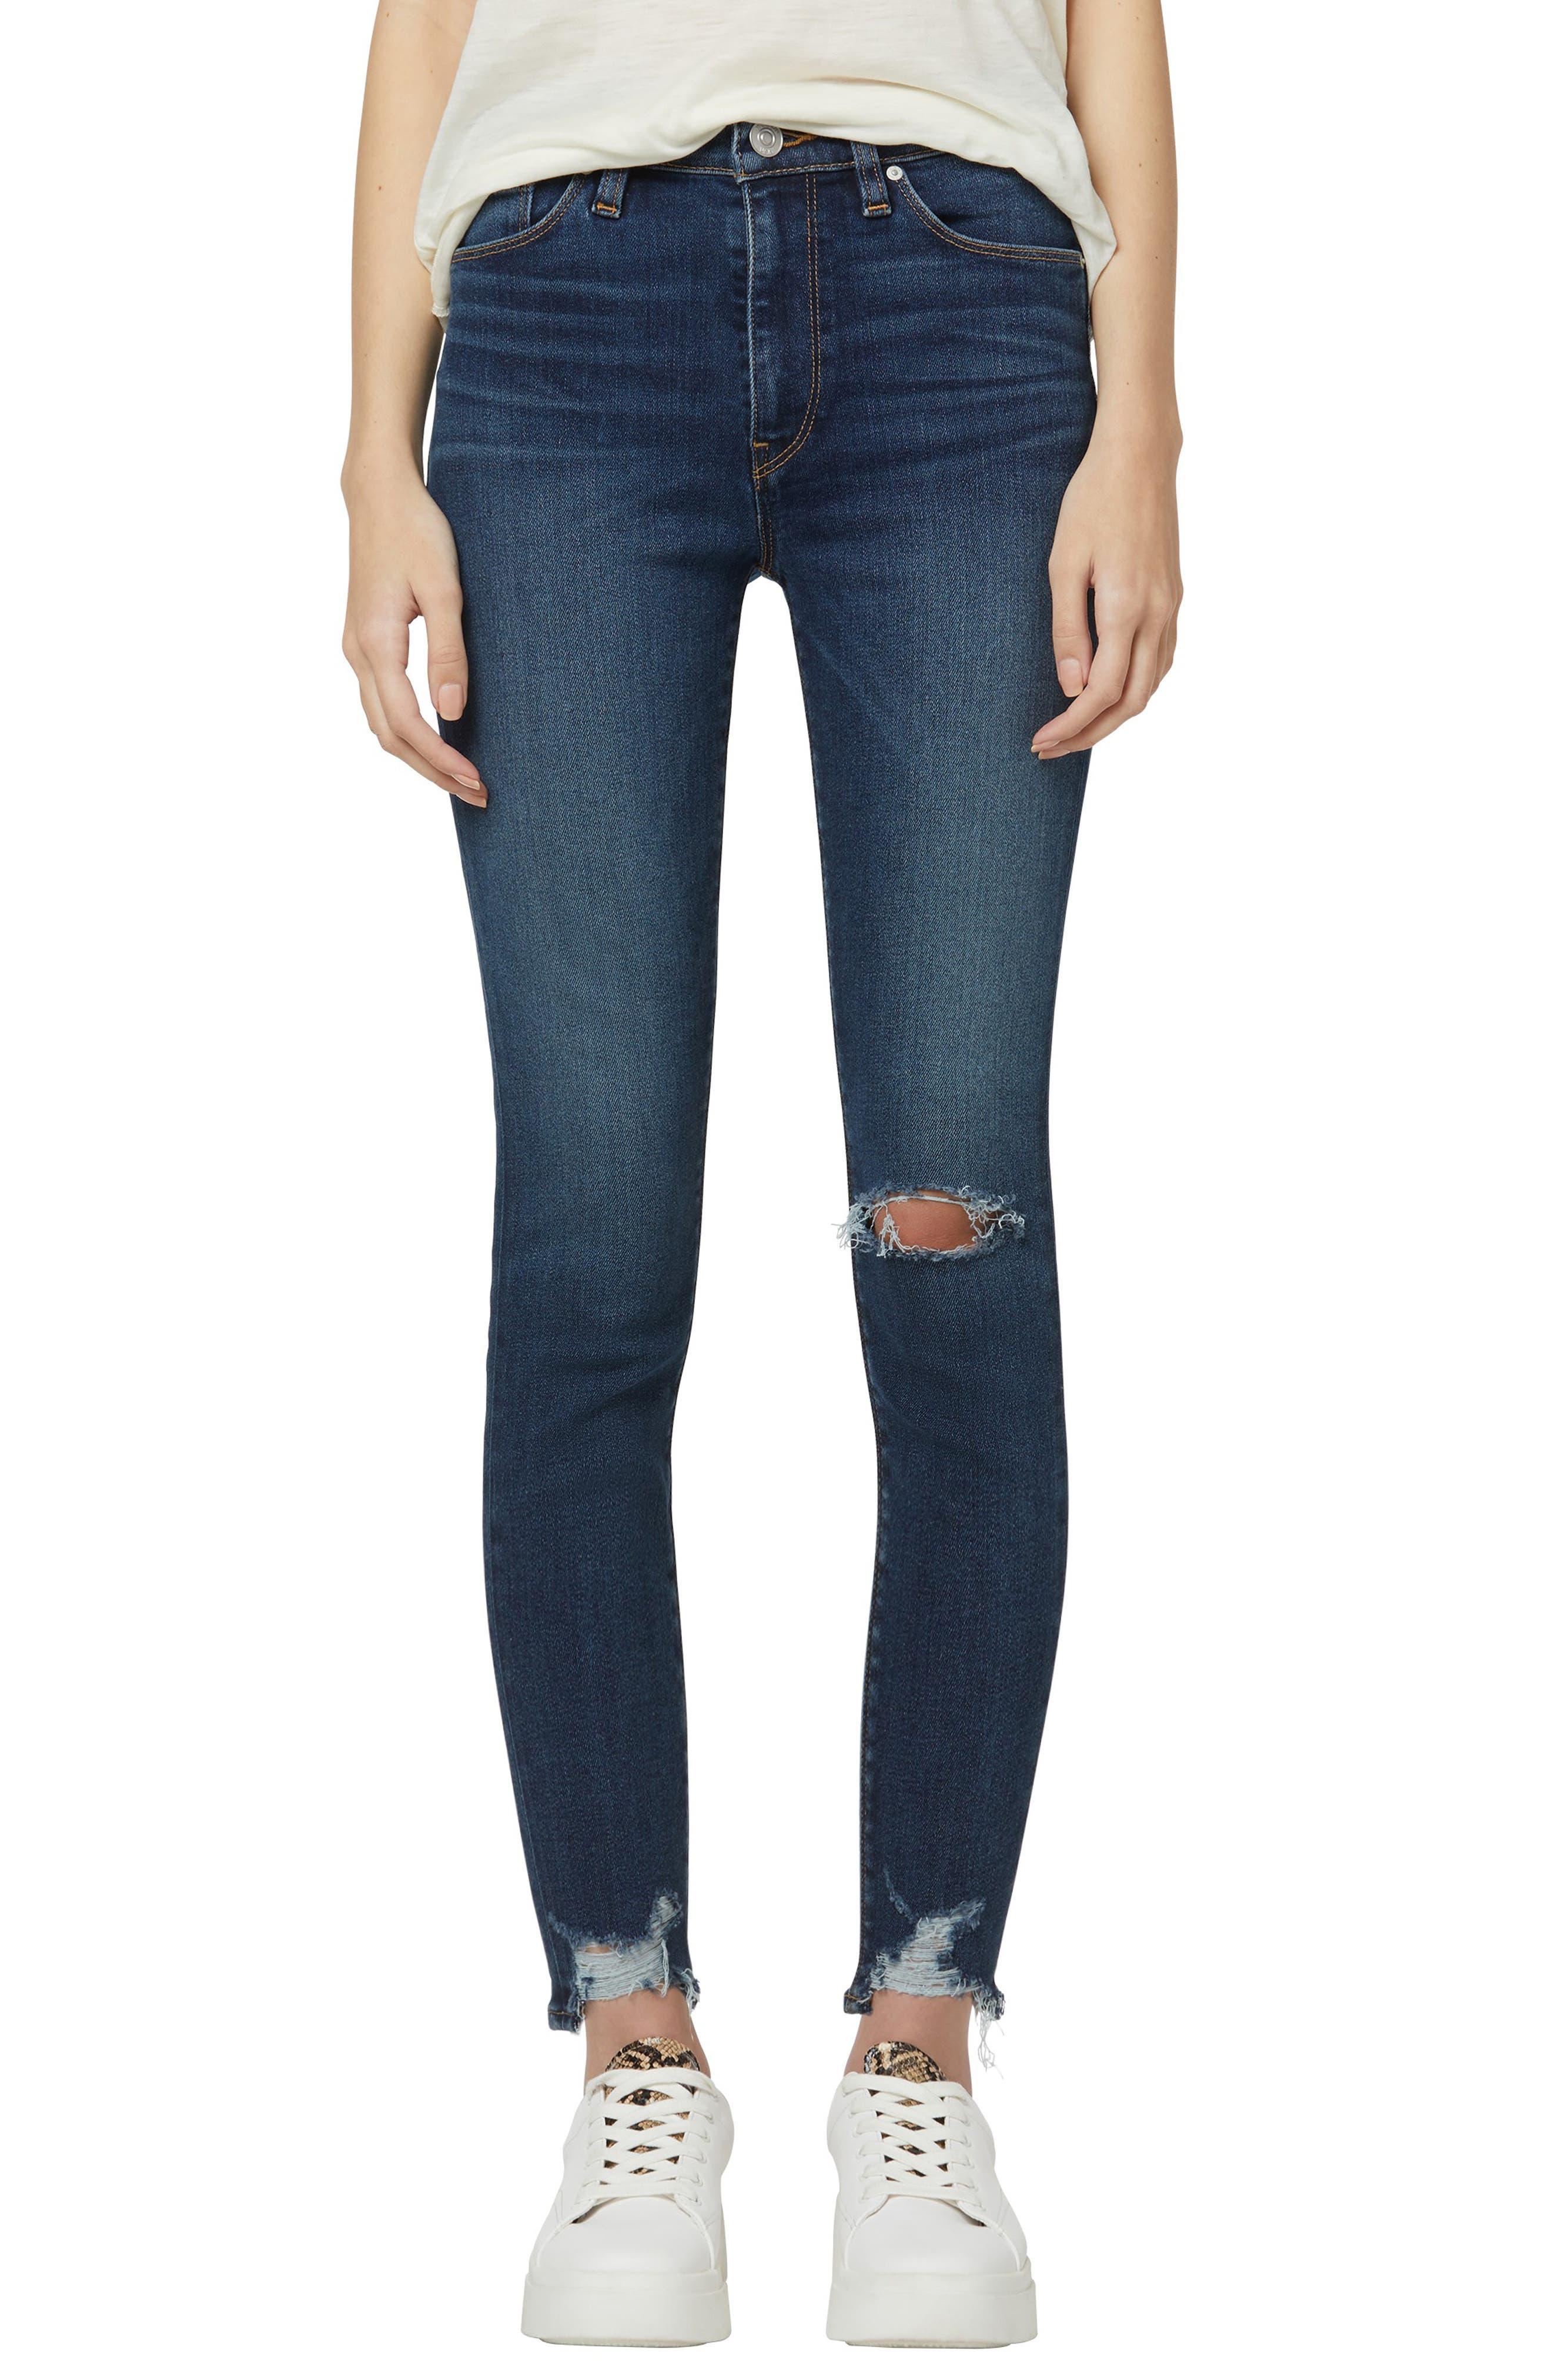 Barbara Ripped High Waist Super Skinny Jeans